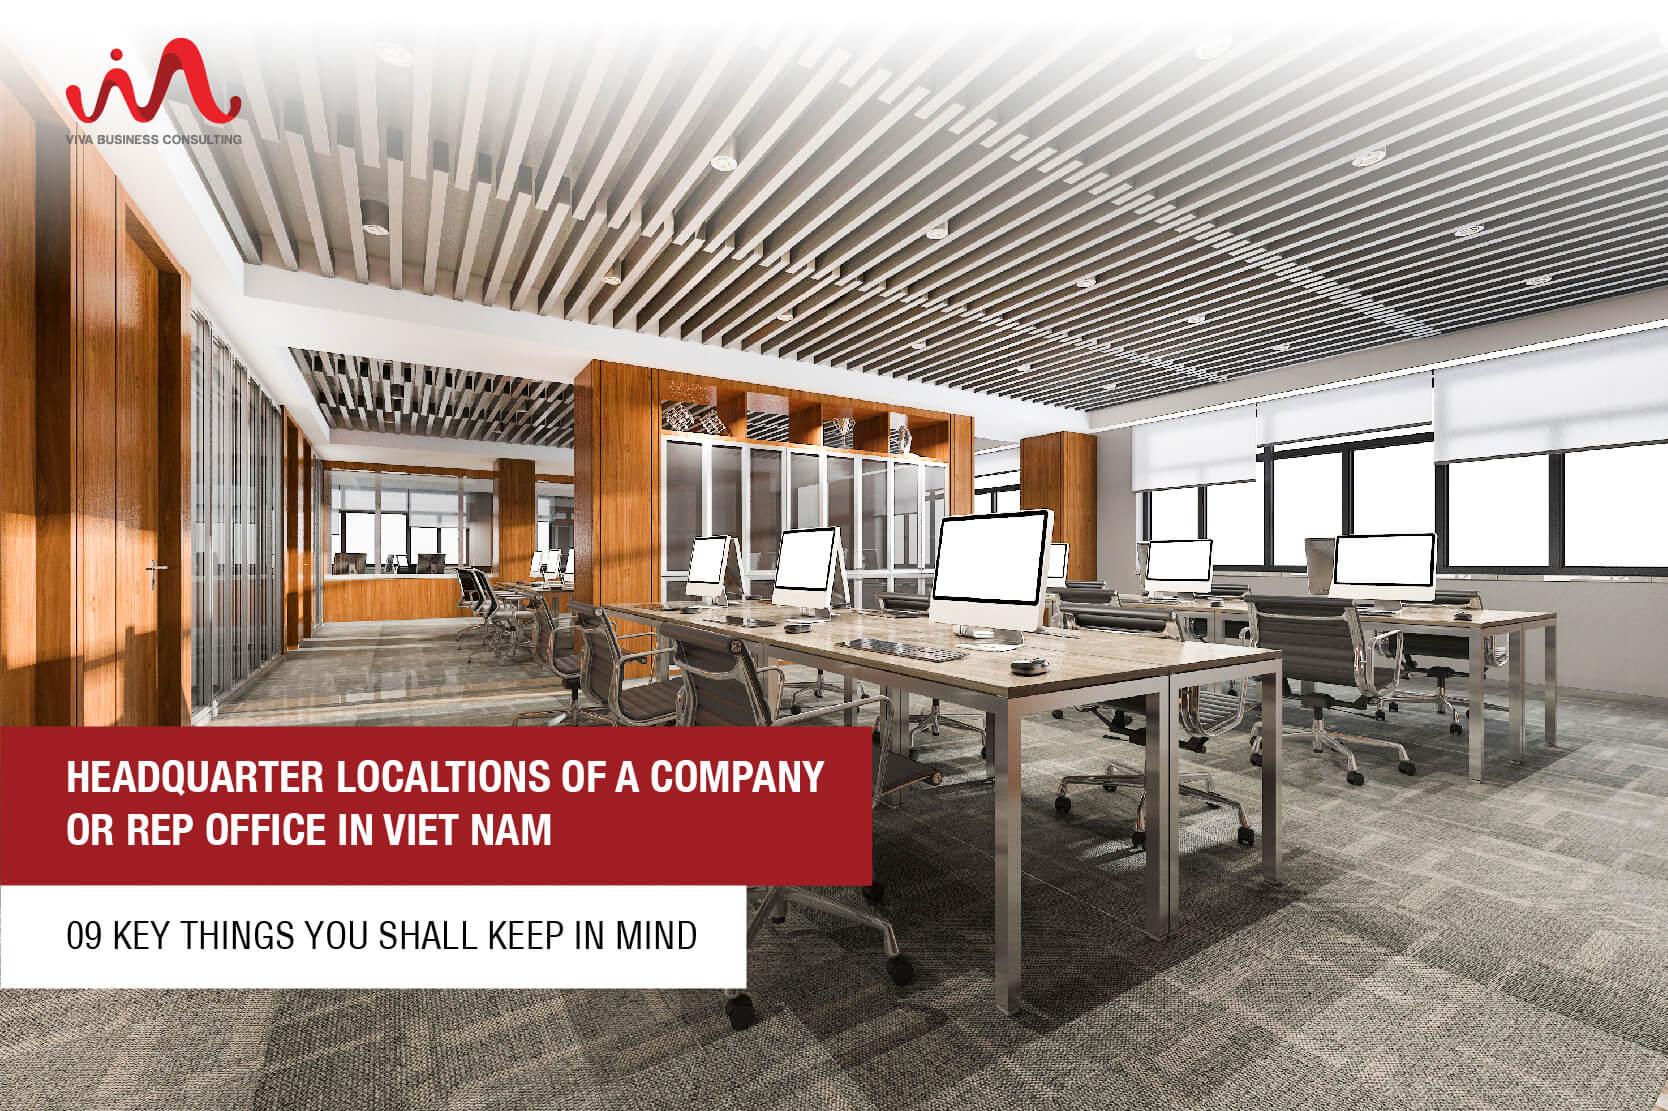 Headquarter locations of a company